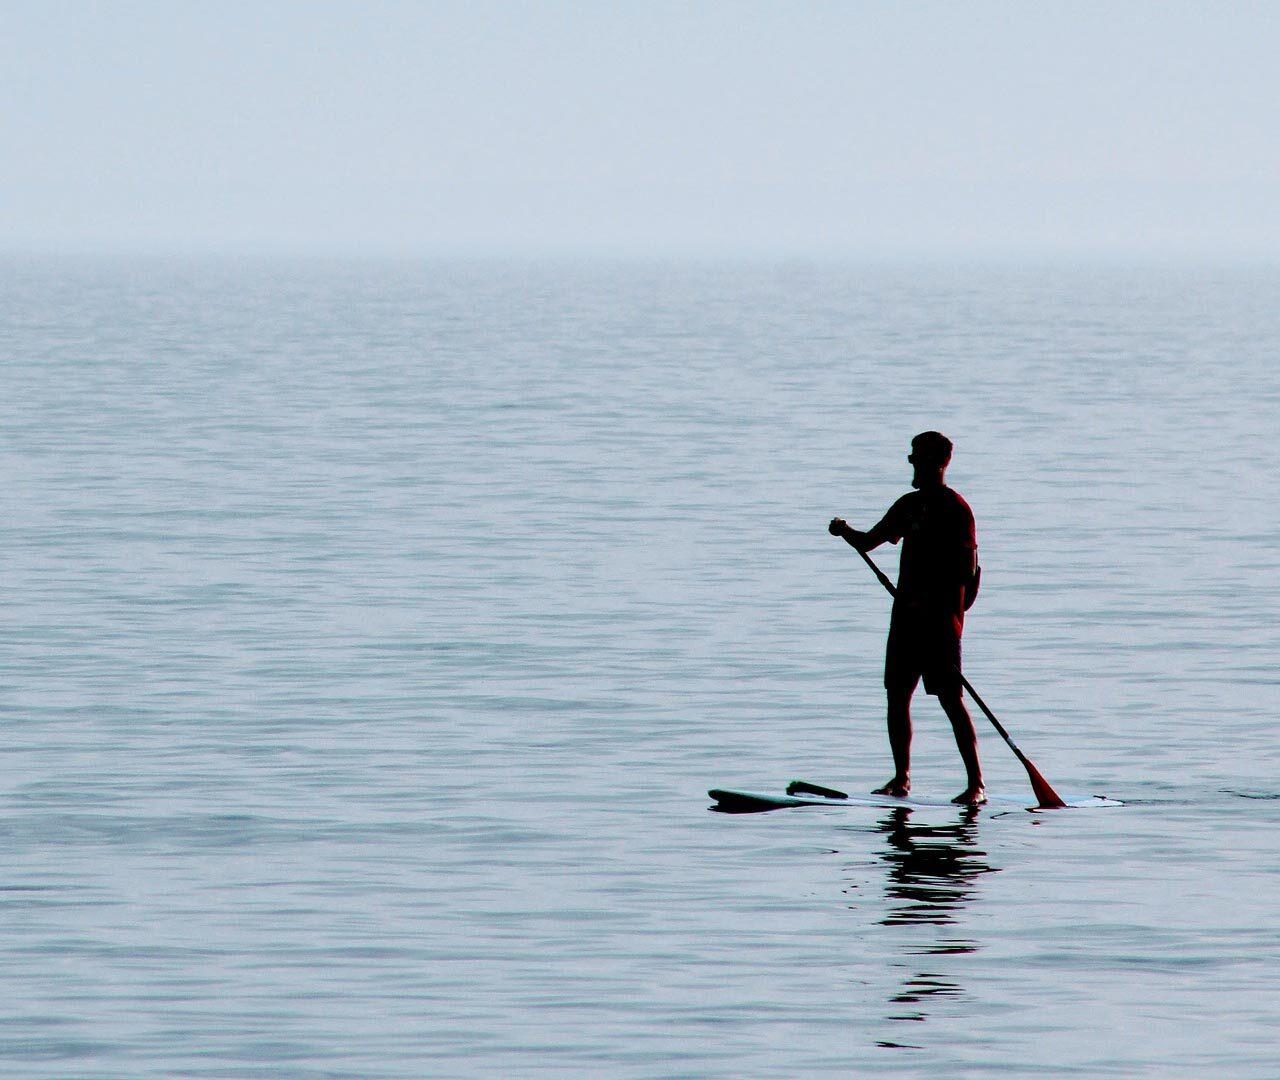 stand-up-paddle-noleggio-sup-monopoli-seaward3